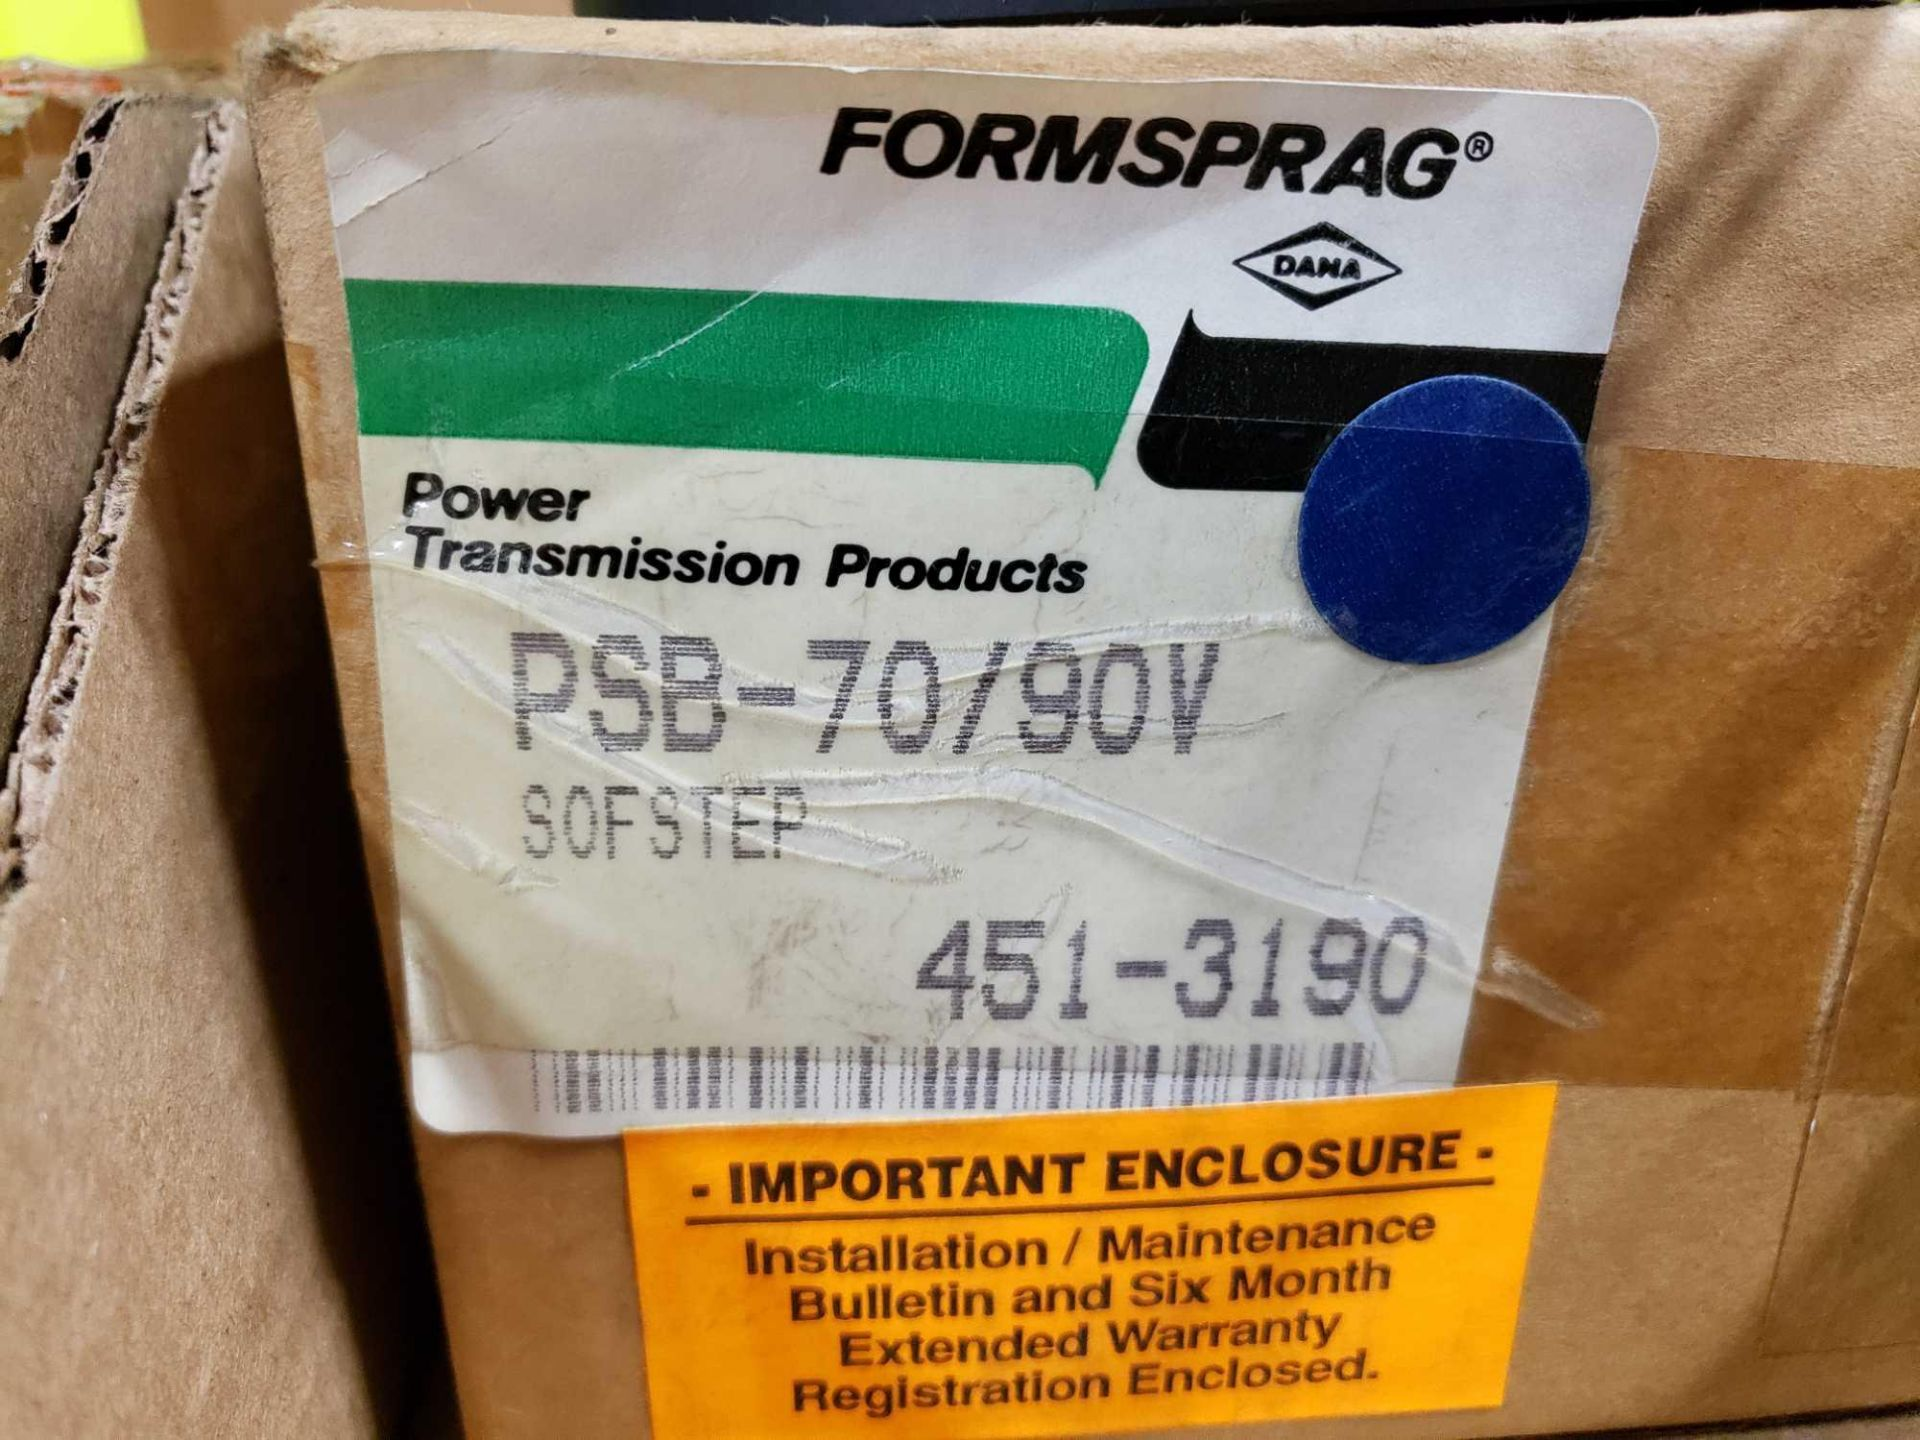 Lot 13 - Formsprag Magpowr sofstep model PSB-70/90V magnetic partical clutch brake. New in box.